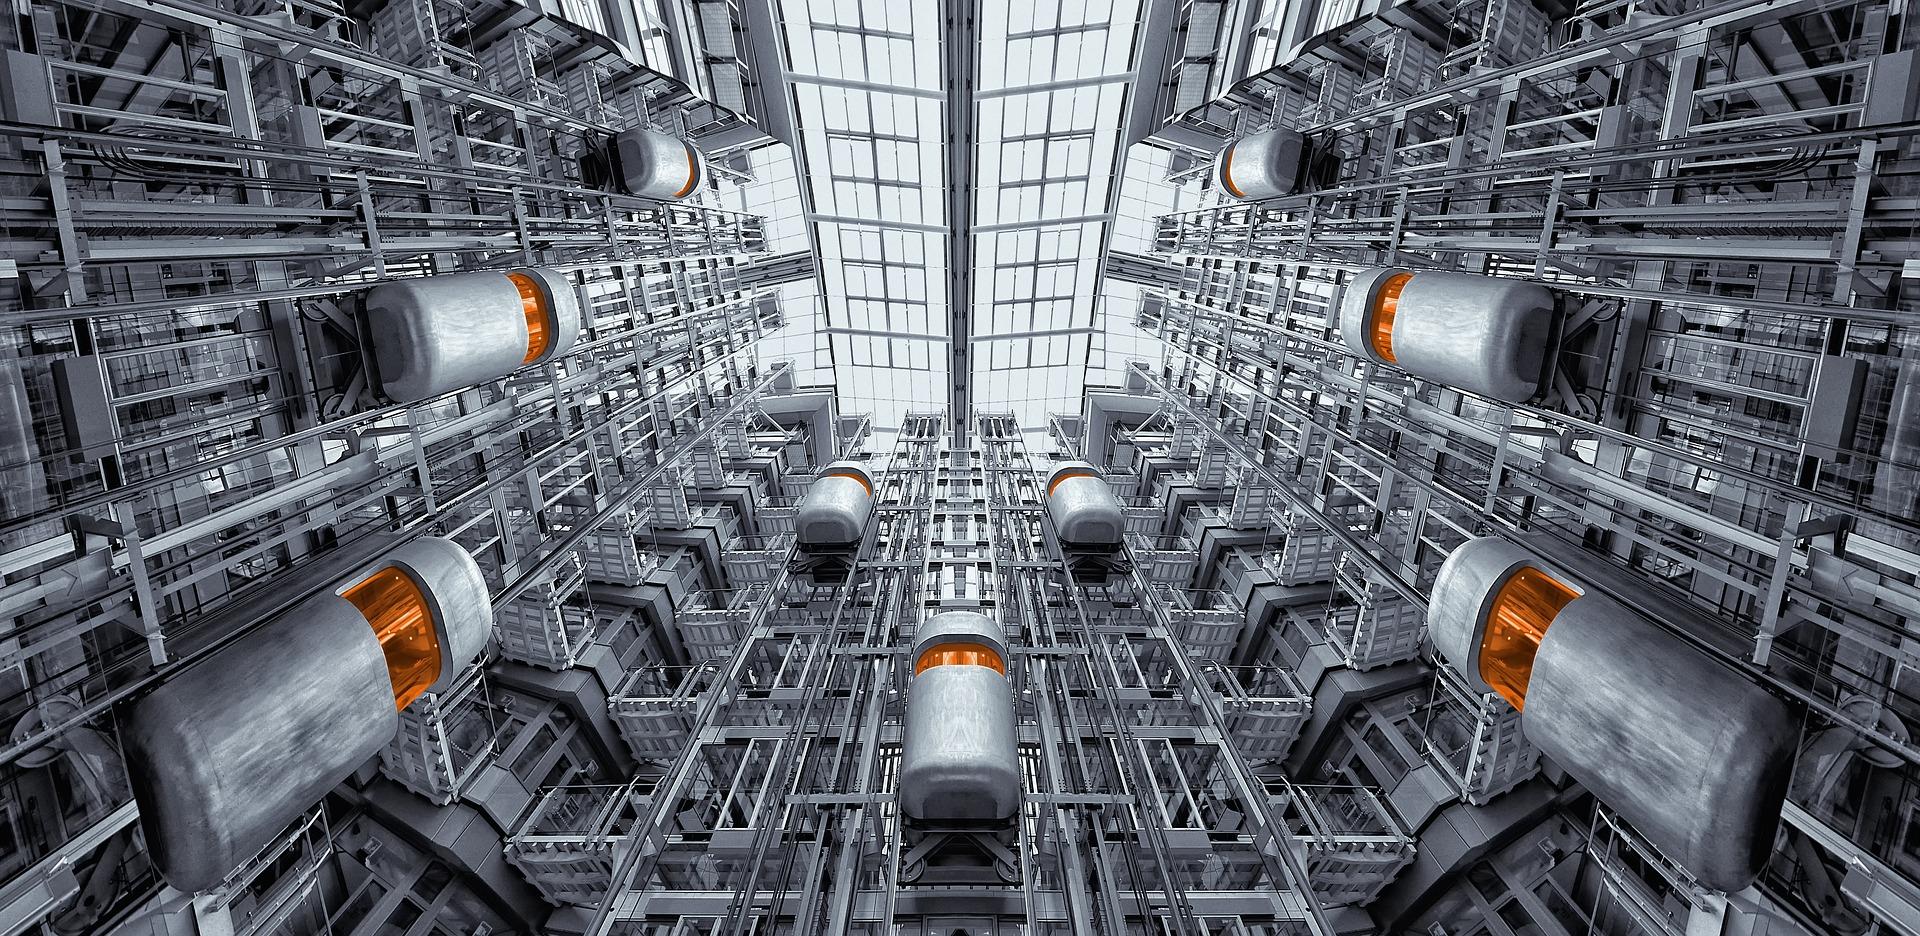 ascensor con o sin cuarto de maquinas